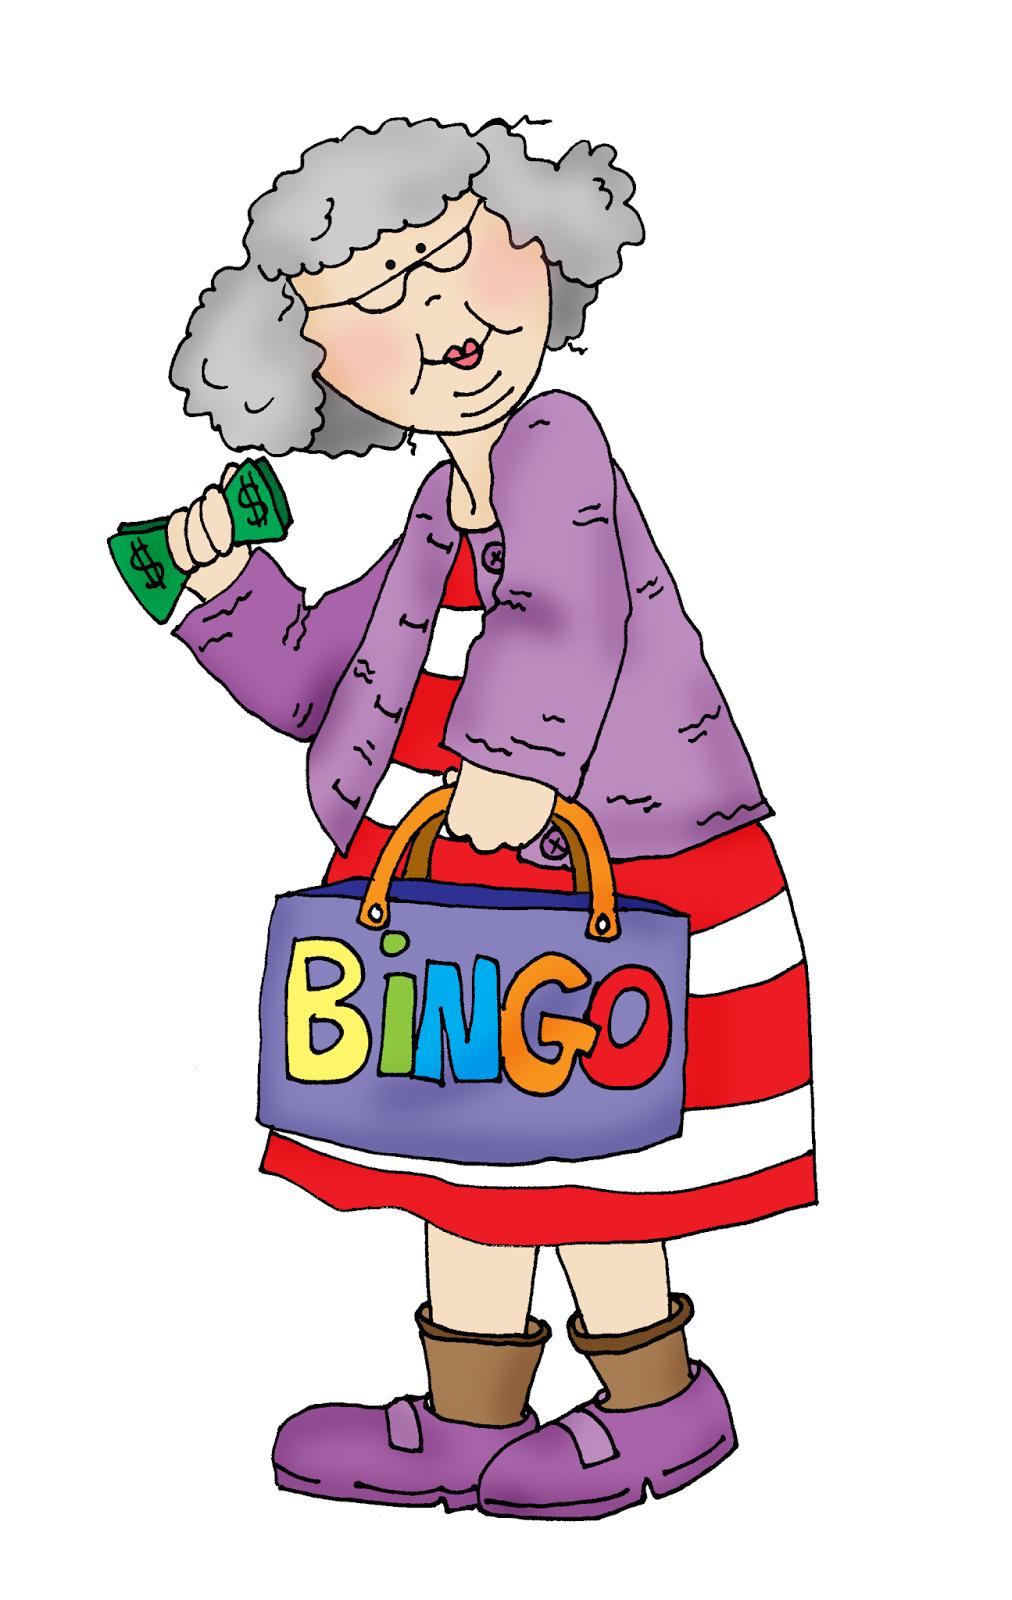 bingo granny free dearie dolls digi stamps digi stamps stamps rh za pinterest com free bing clip art images free bingo clip art images